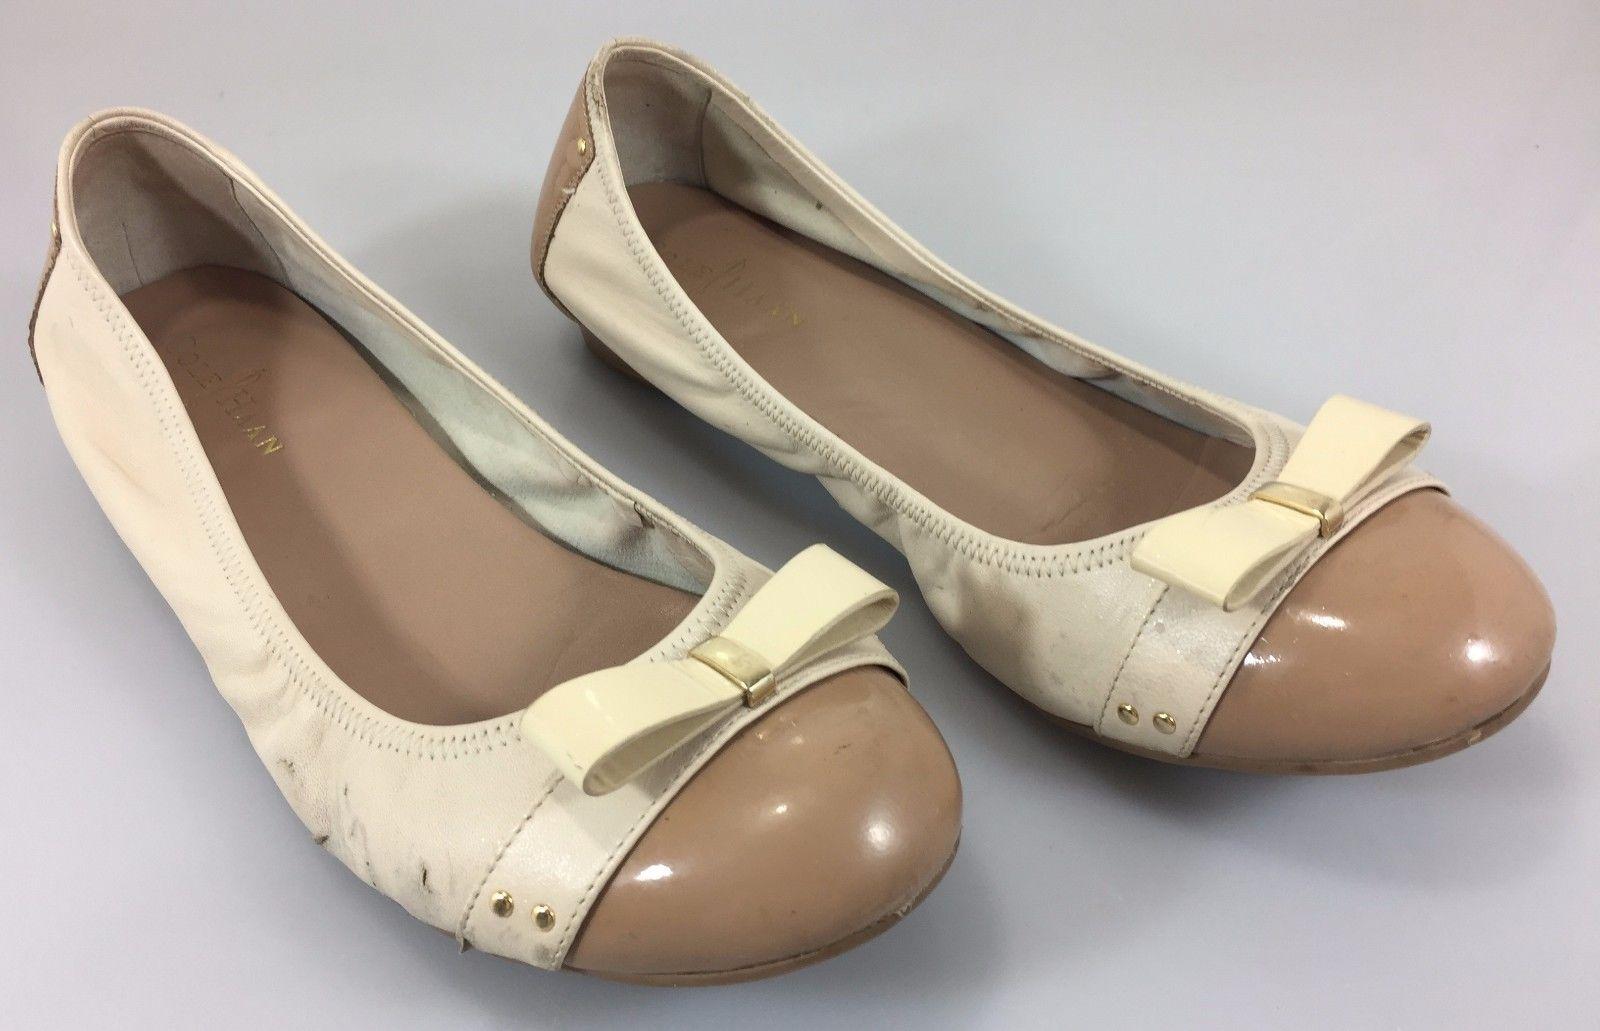 99164c8f0c24 Cole Haan 9.5b Women Flats Tan   Cream Nike Air Soles -  29.99